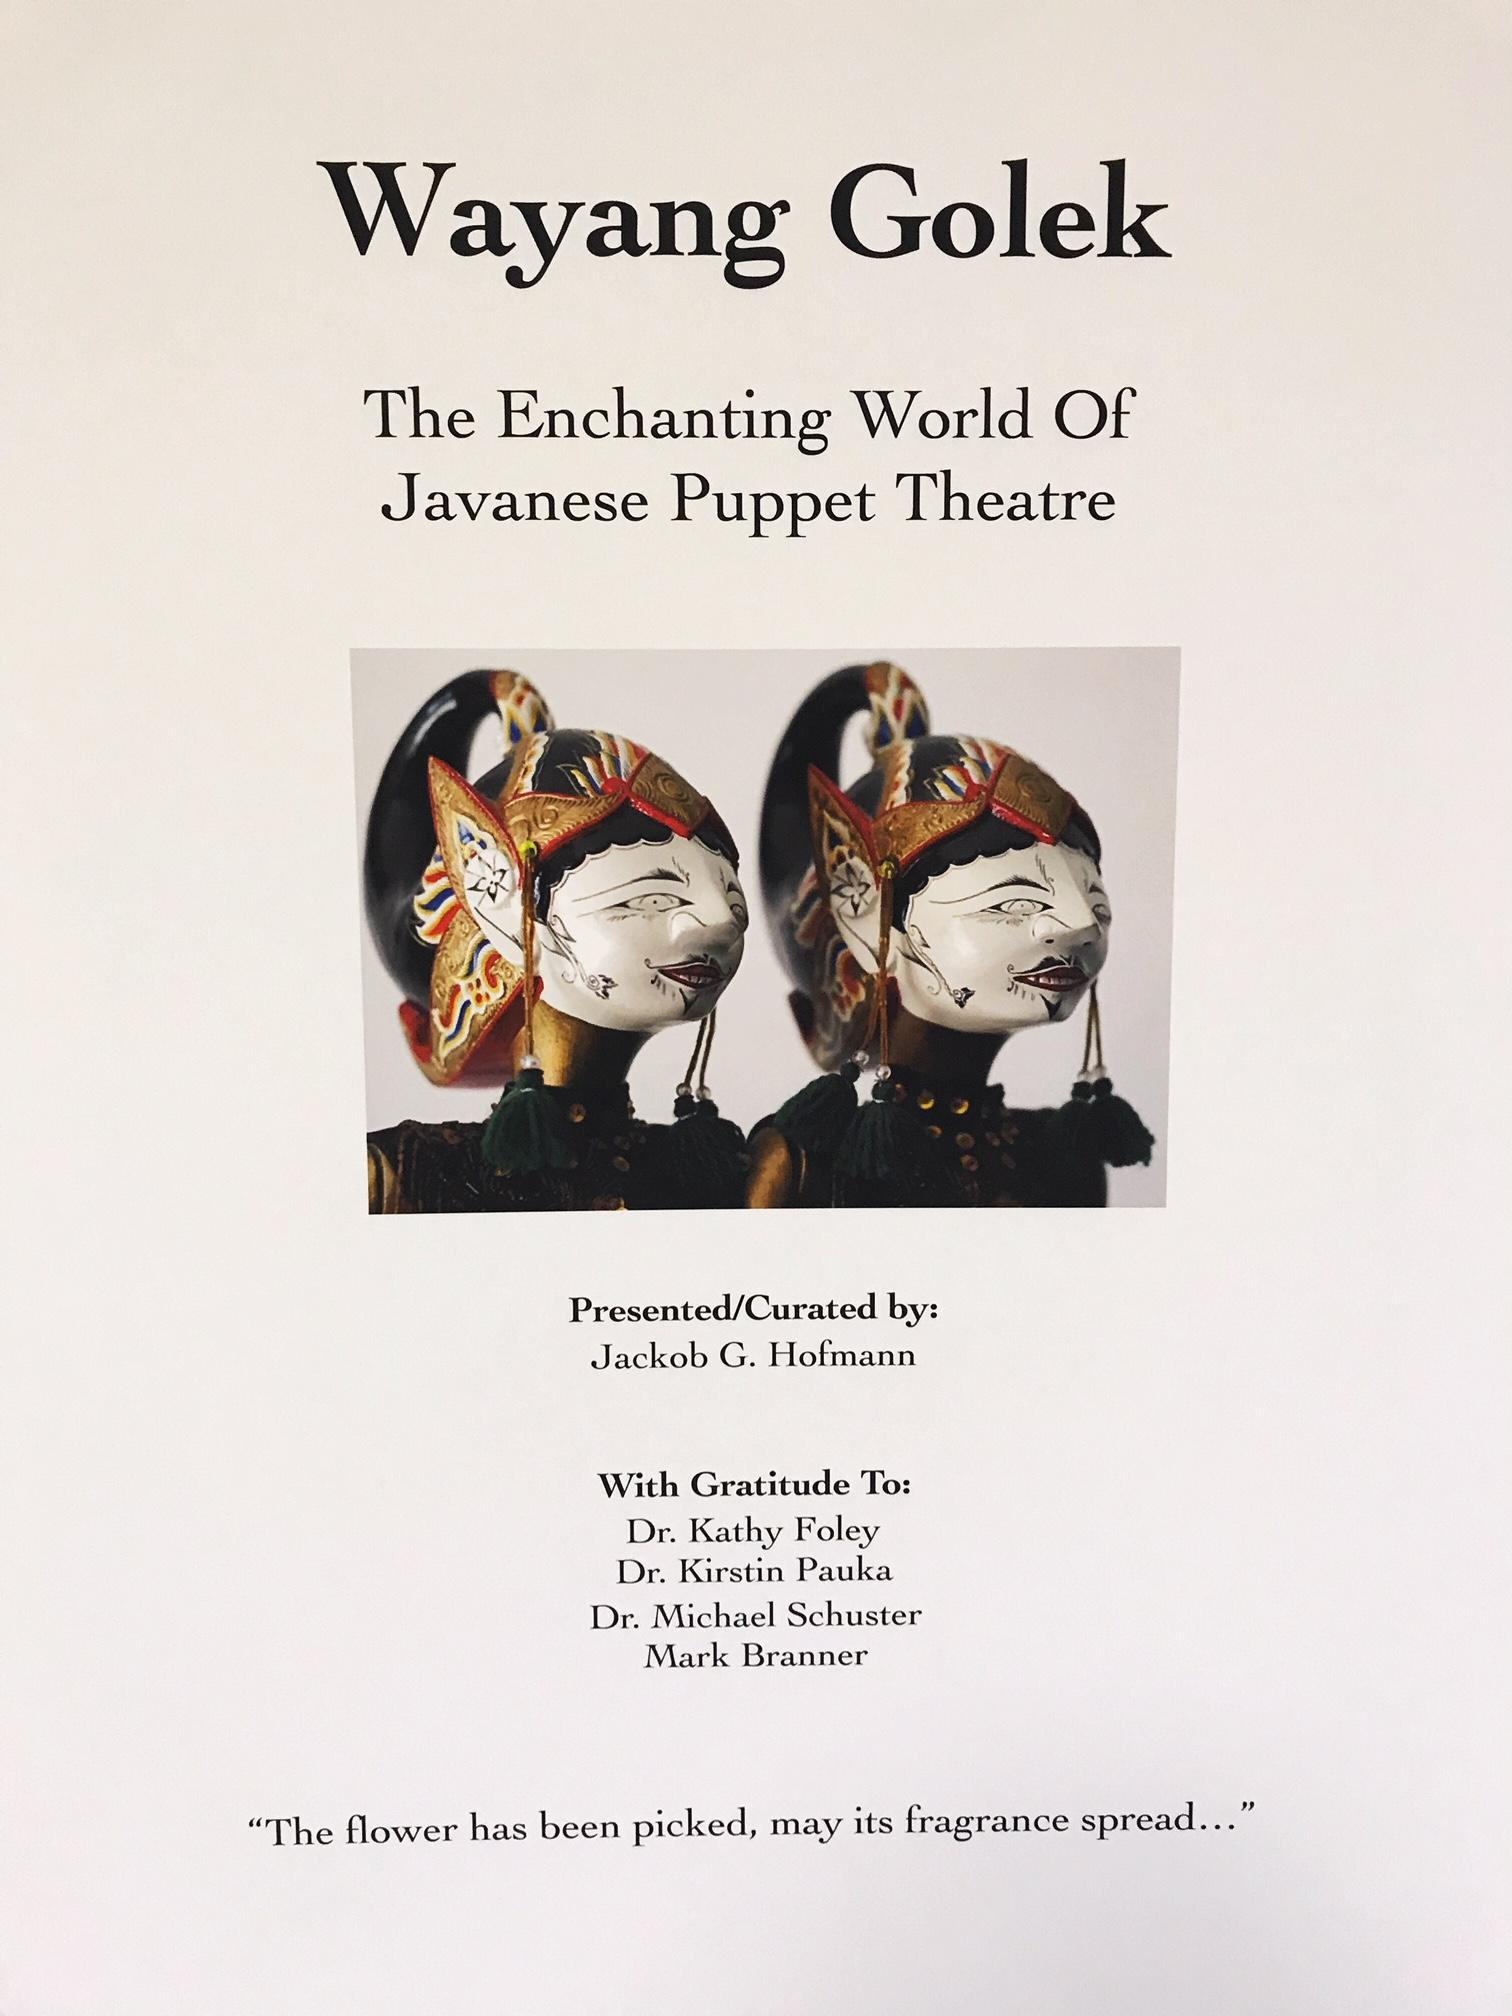 Wayang Golek. The enchanting world of javanese puppet theatre